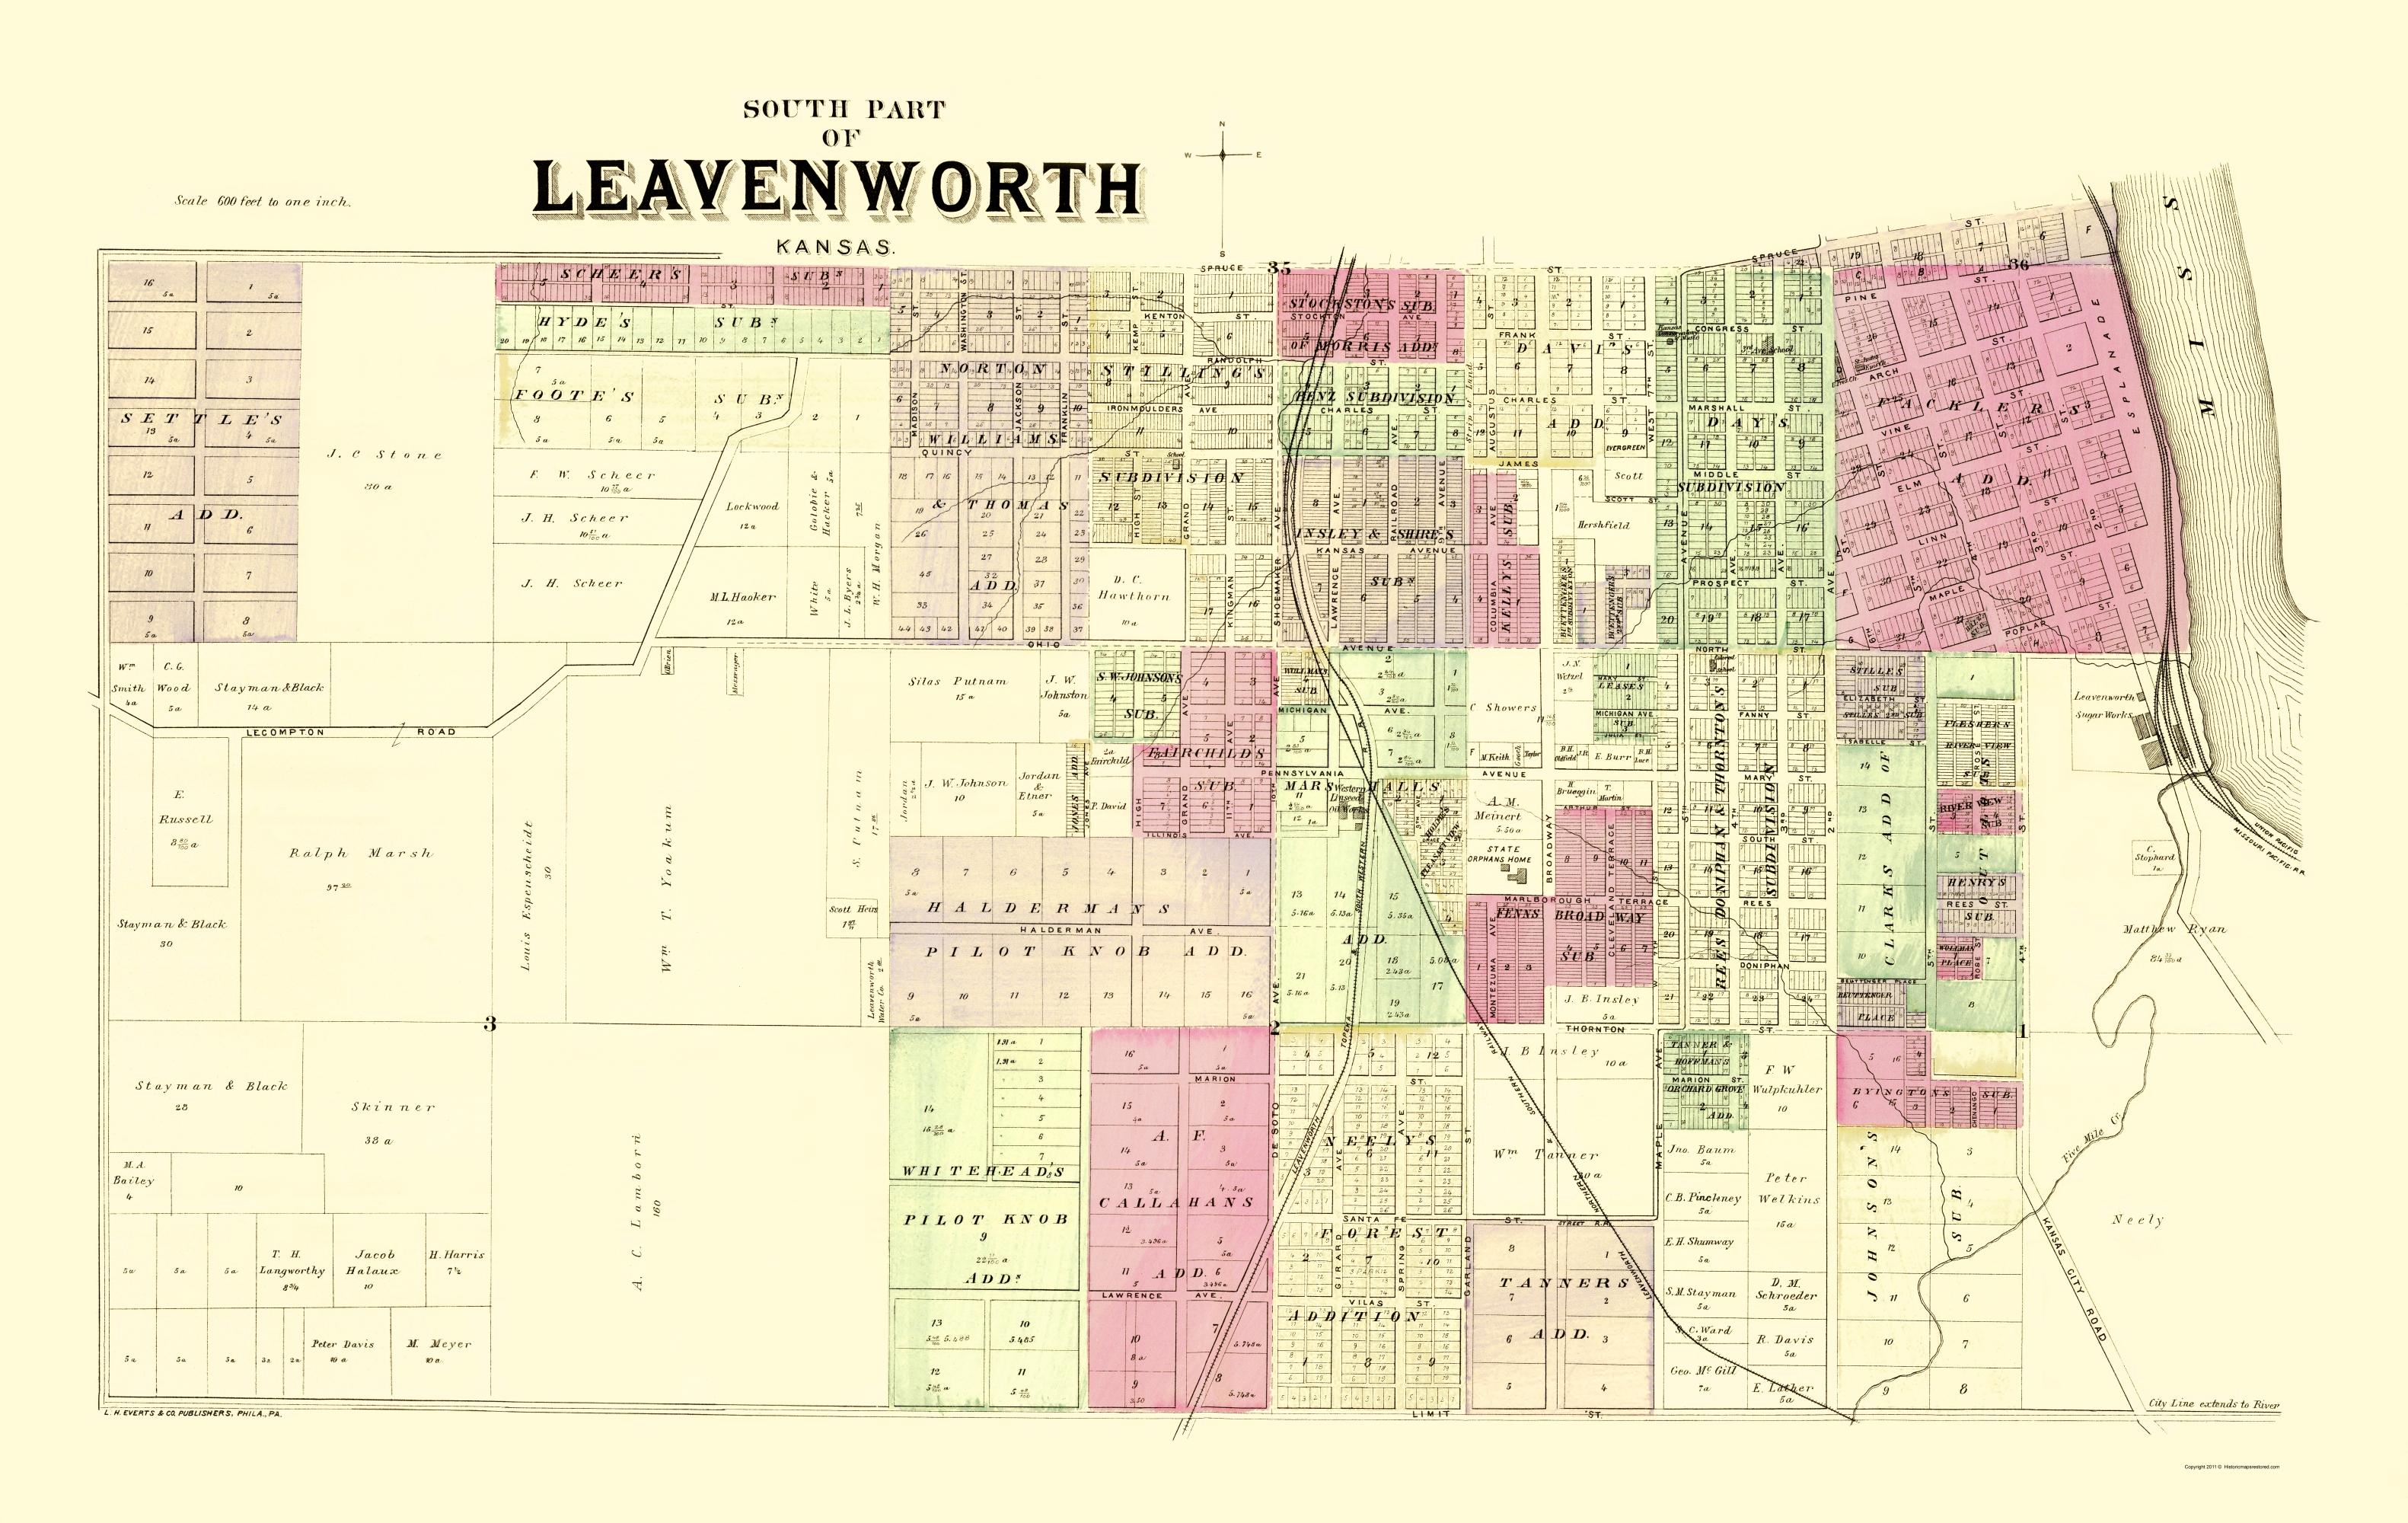 Old Kansas Map.Old City Map Leavenworth South 2 Of 3 Kansas 1887